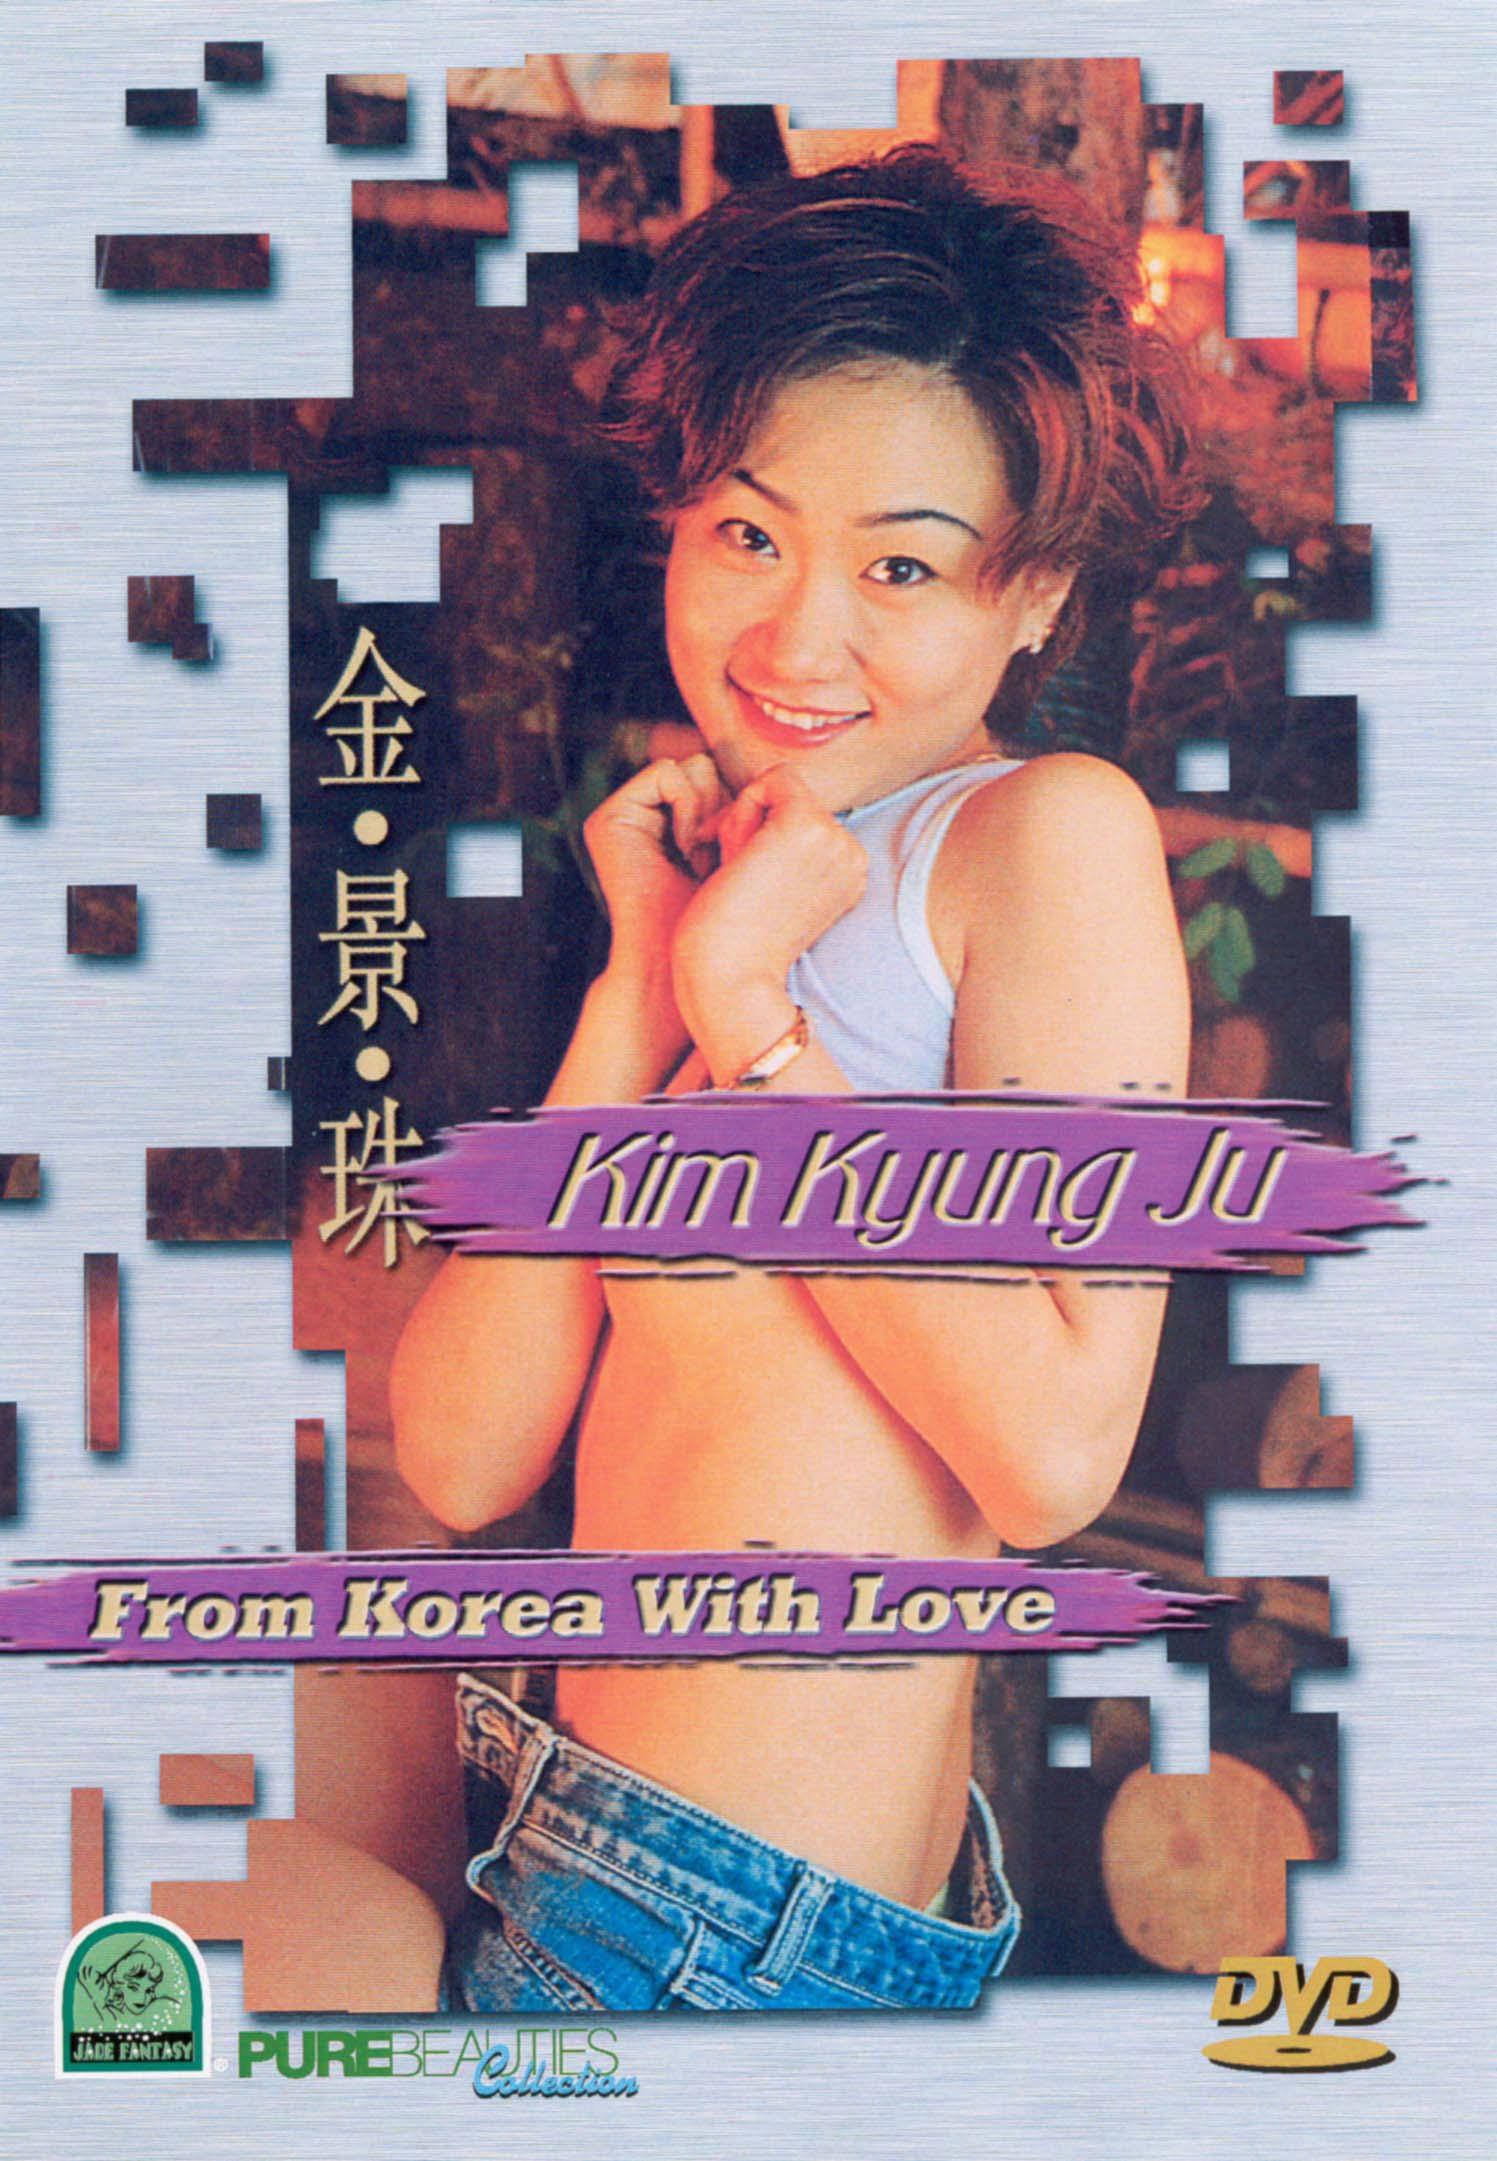 Kim Kyung Ju: From Korea With Love